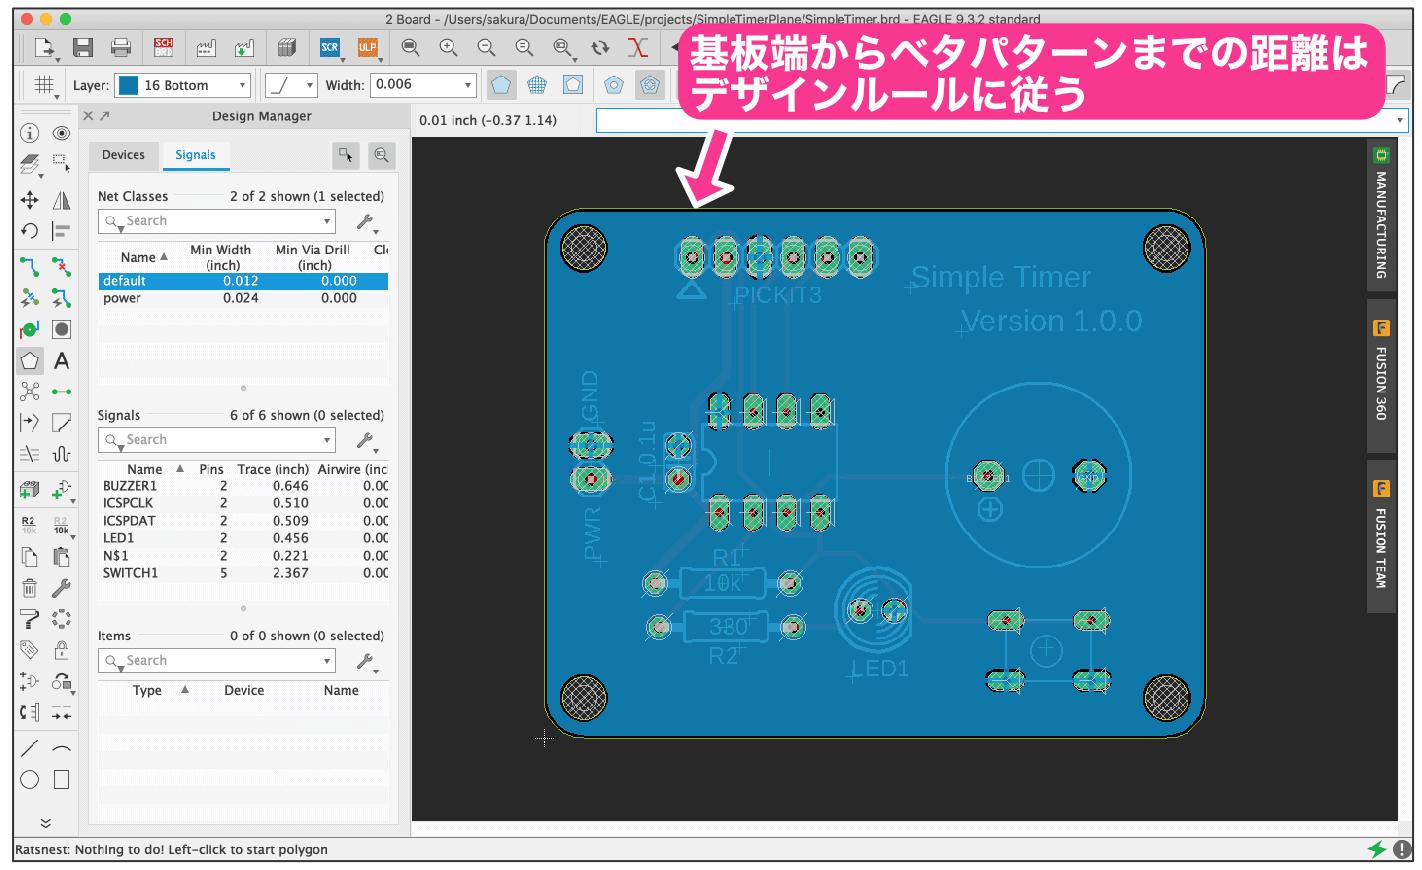 AutodeskEAGLEベタパターク作成新方法1-2